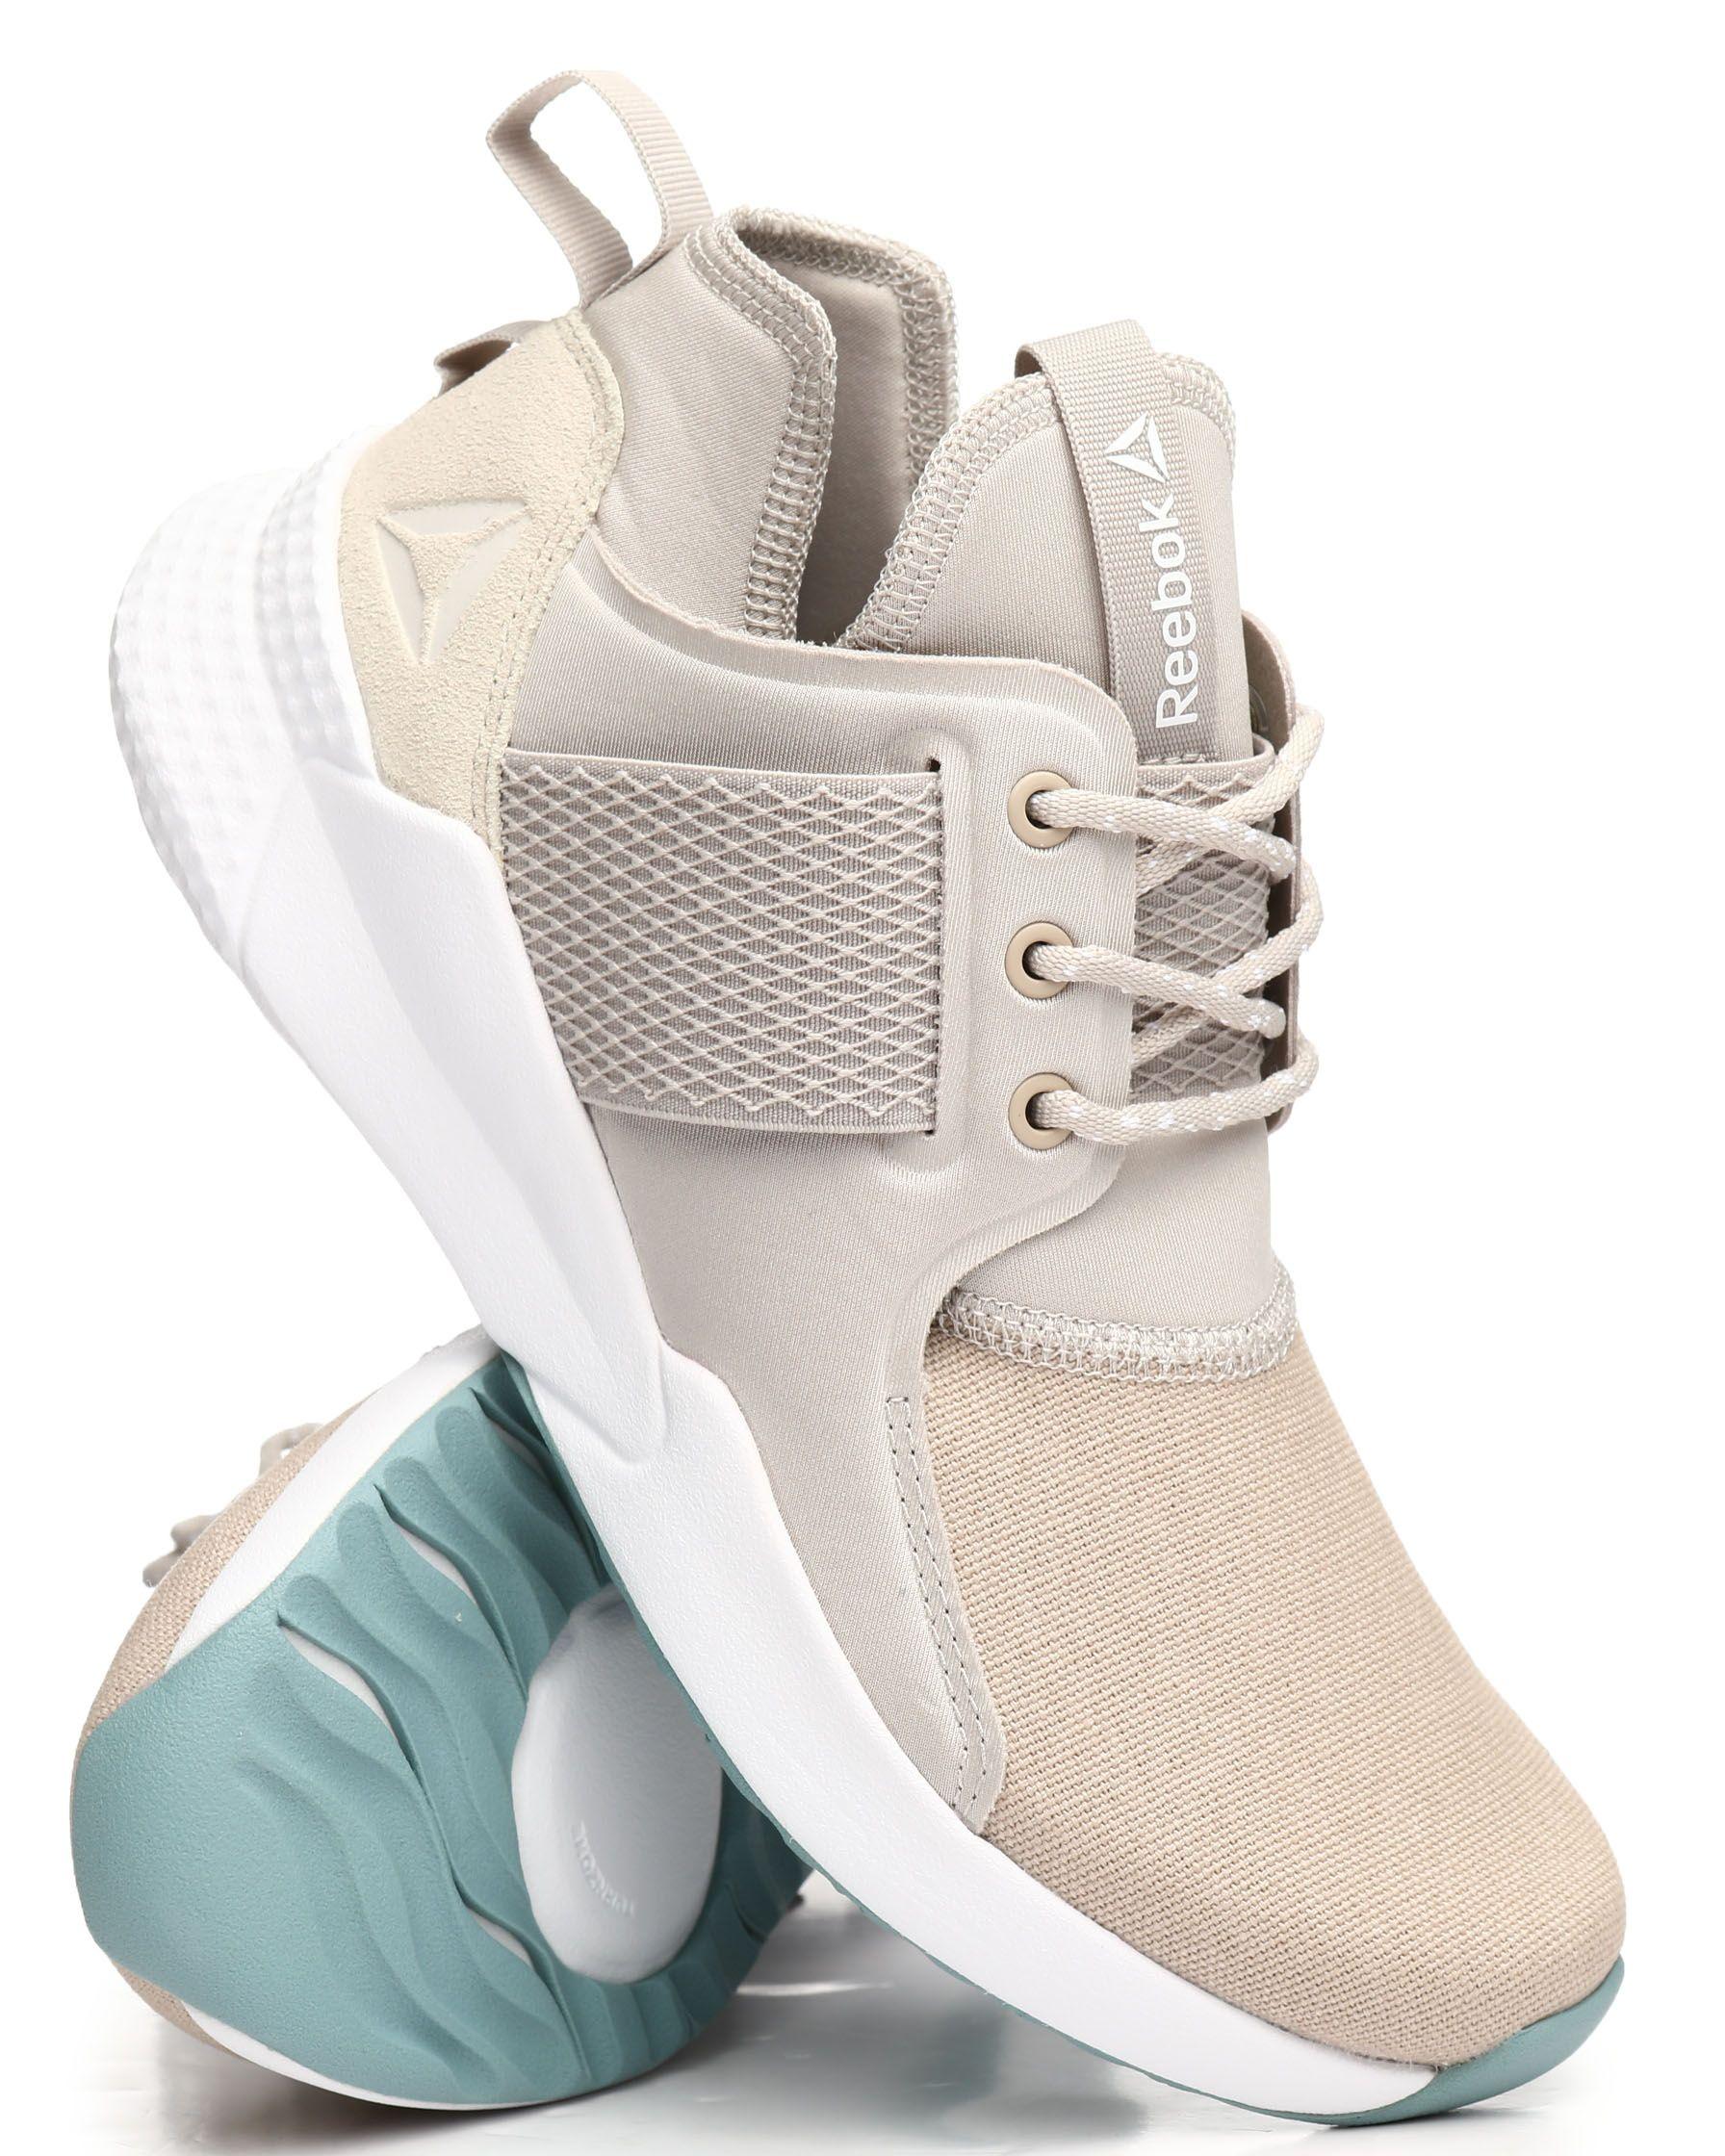 best sneakers 6dbe0 96bf9 Guresu 1.0 Sneakers Women s Footwear from Reebok at DrJays.com